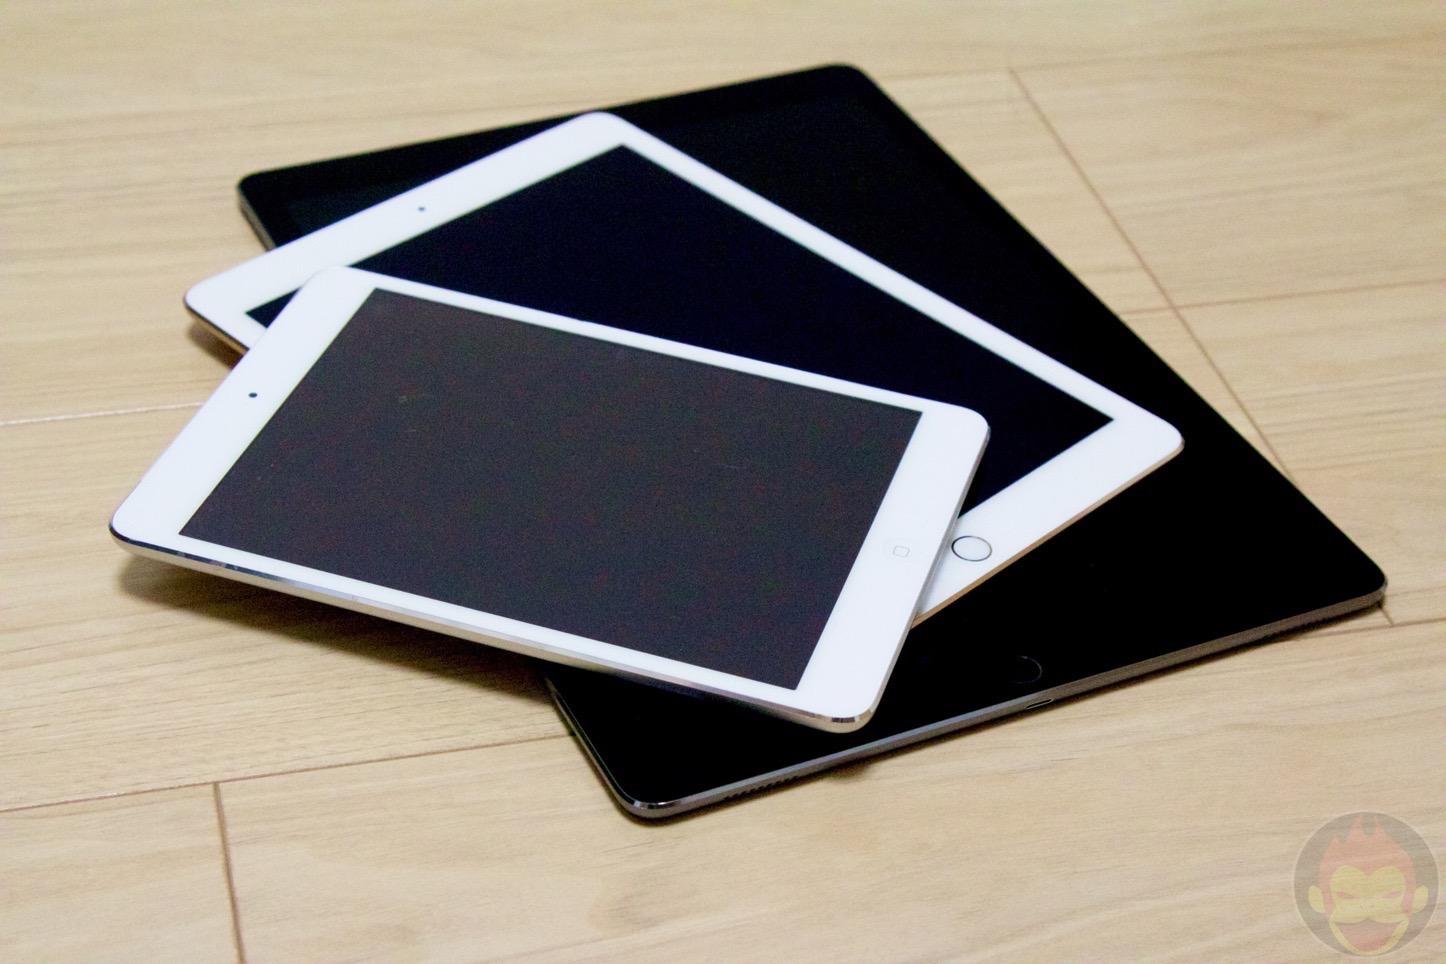 iPad-Pro-Air2-mini2-Comparison-12.jpg